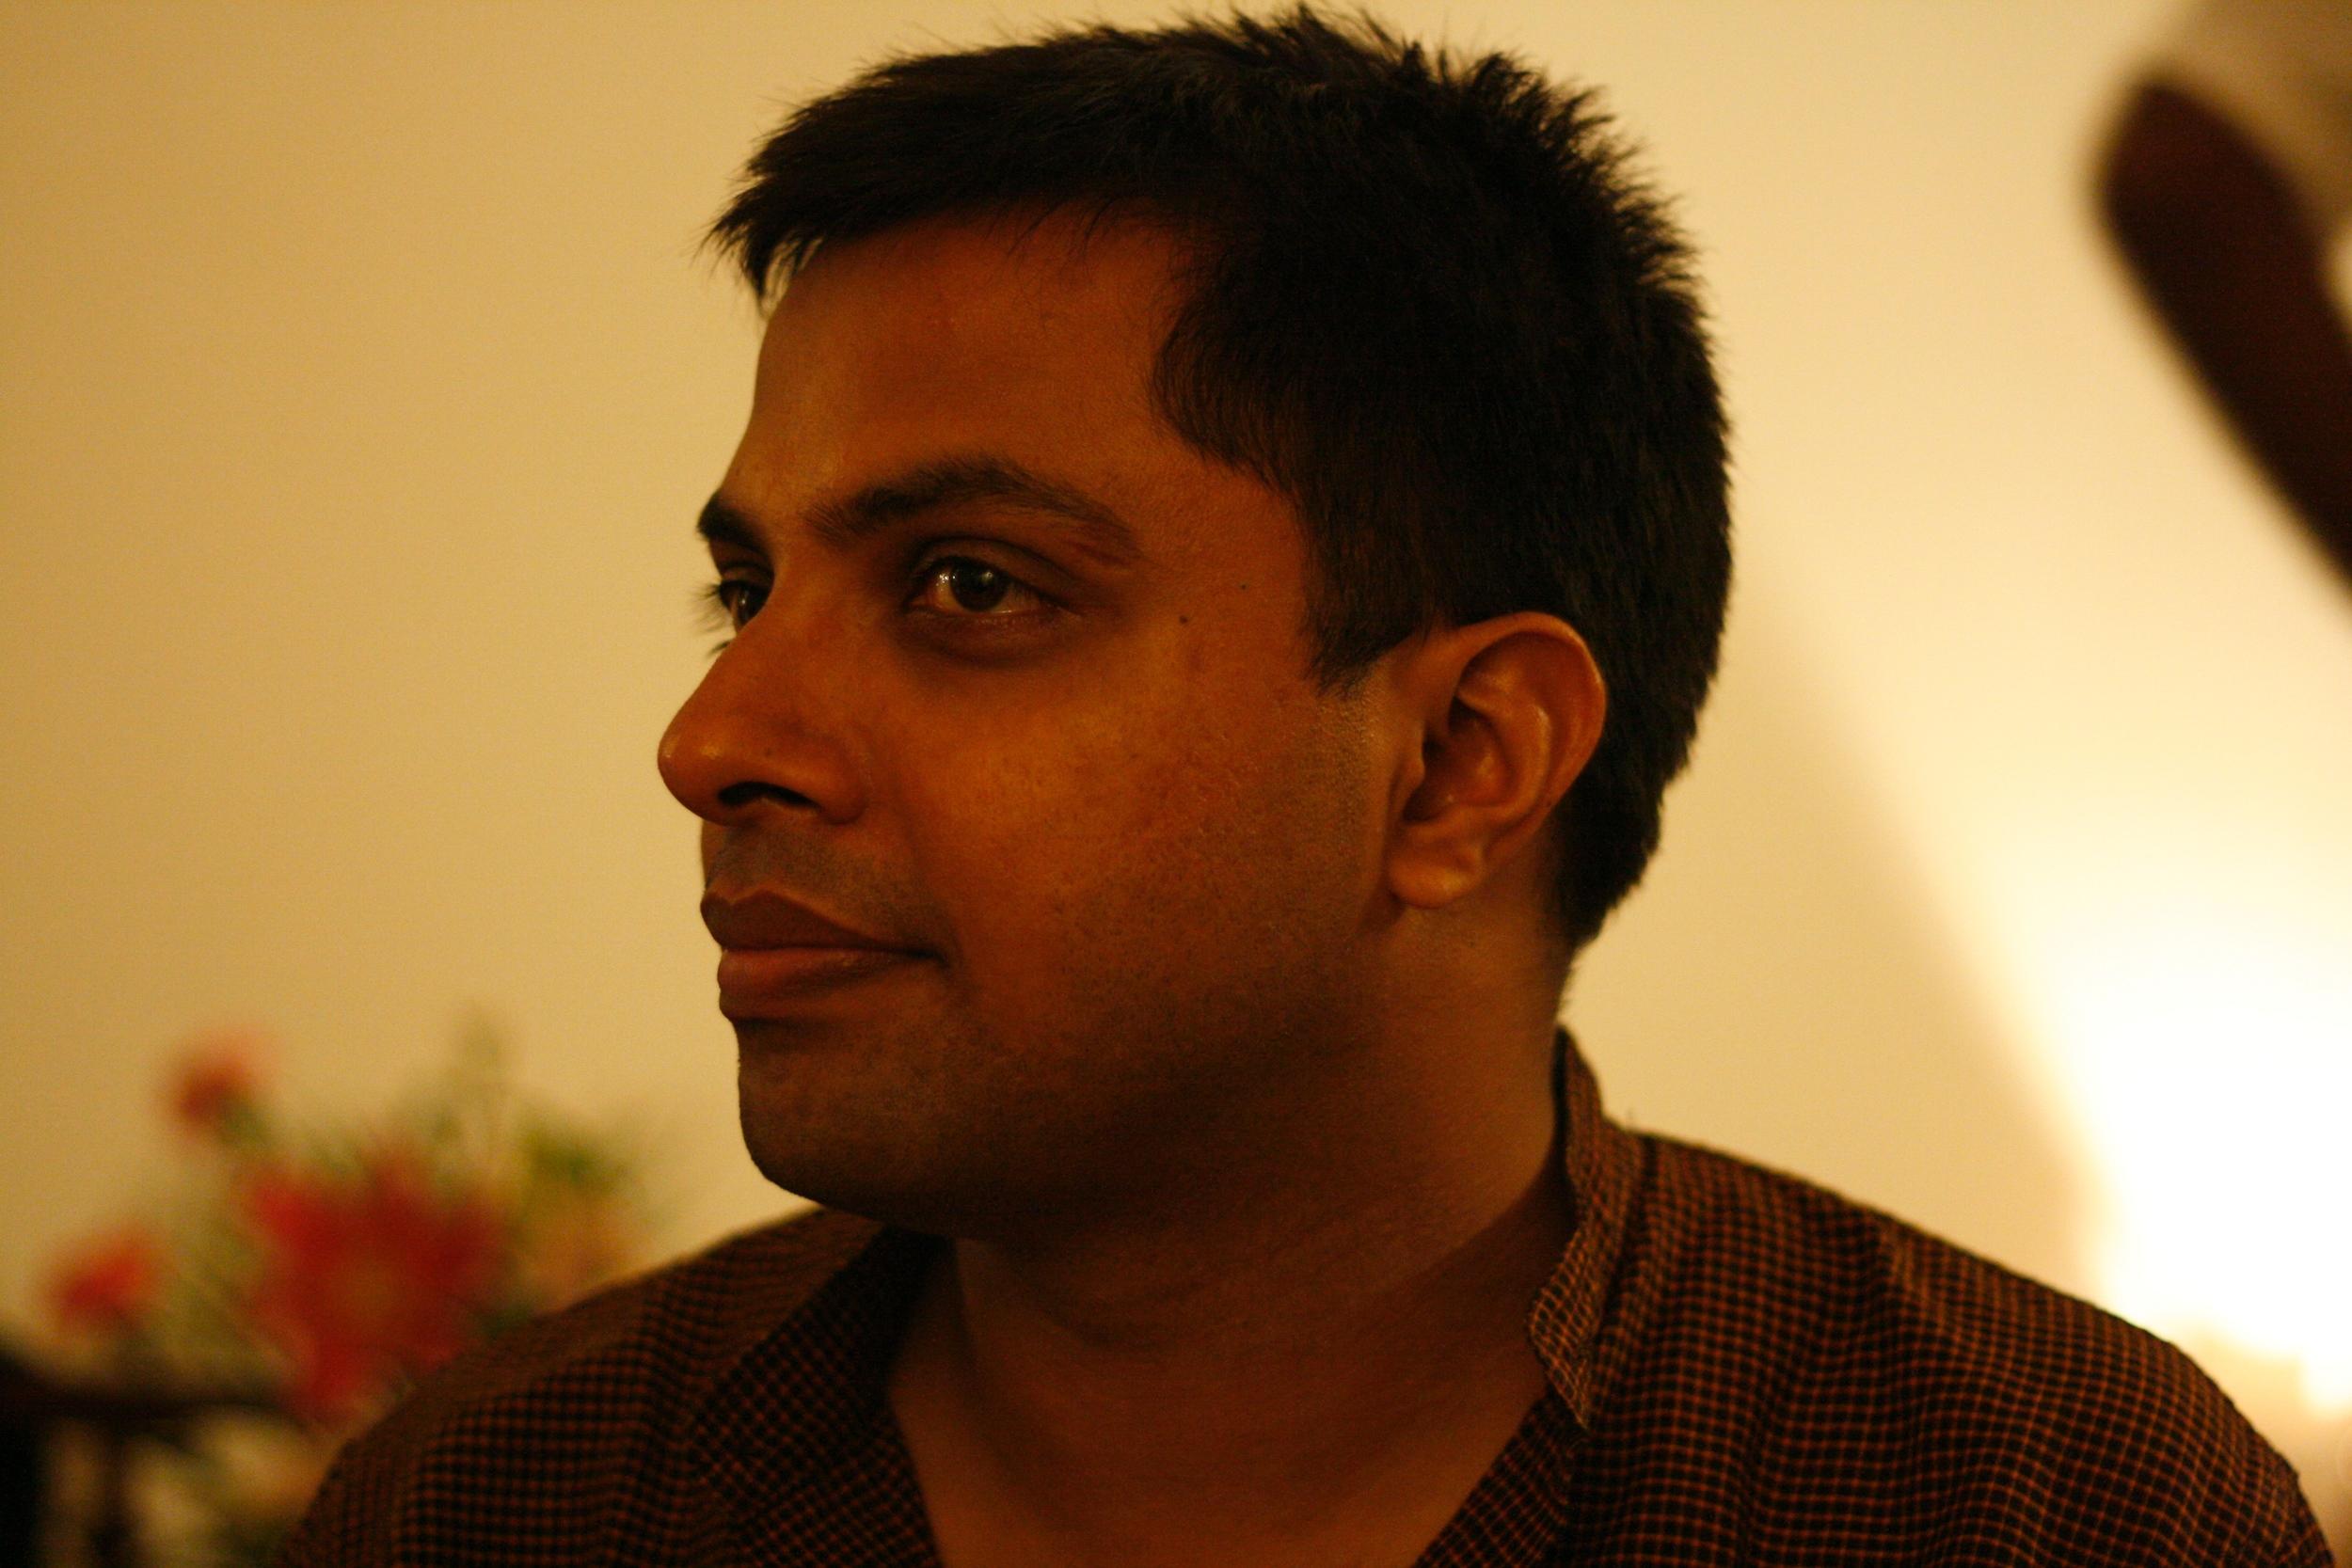 Anuj Bhuwania